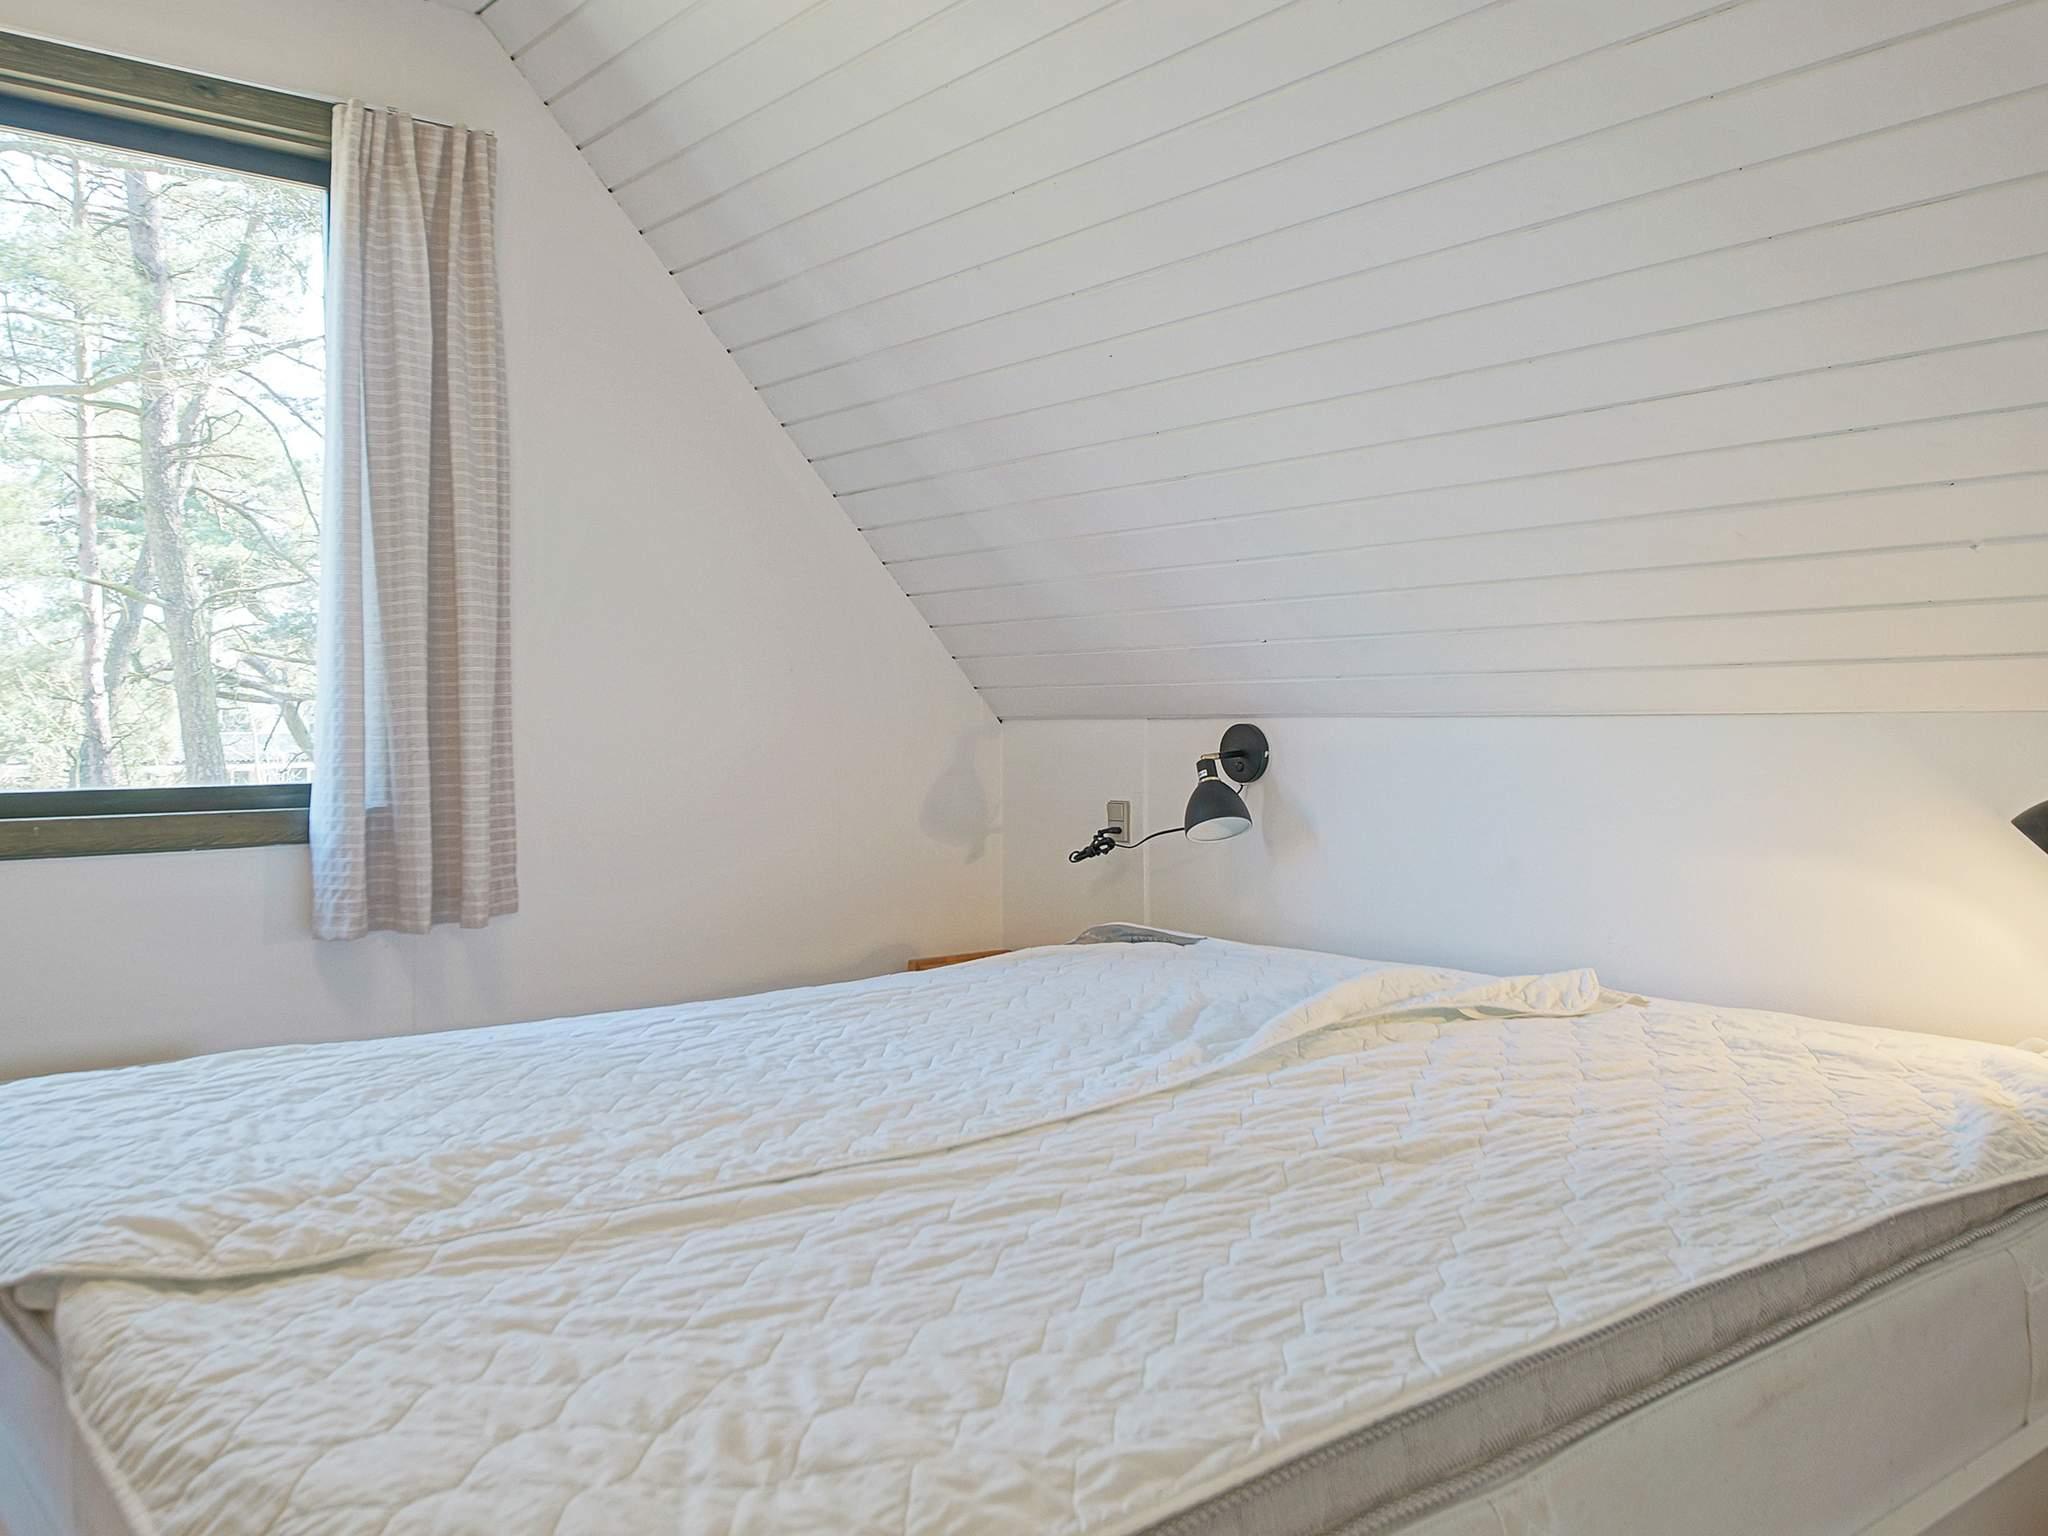 Ferienhaus Balka Strand (81962), Balke, , Bornholm, Dänemark, Bild 8